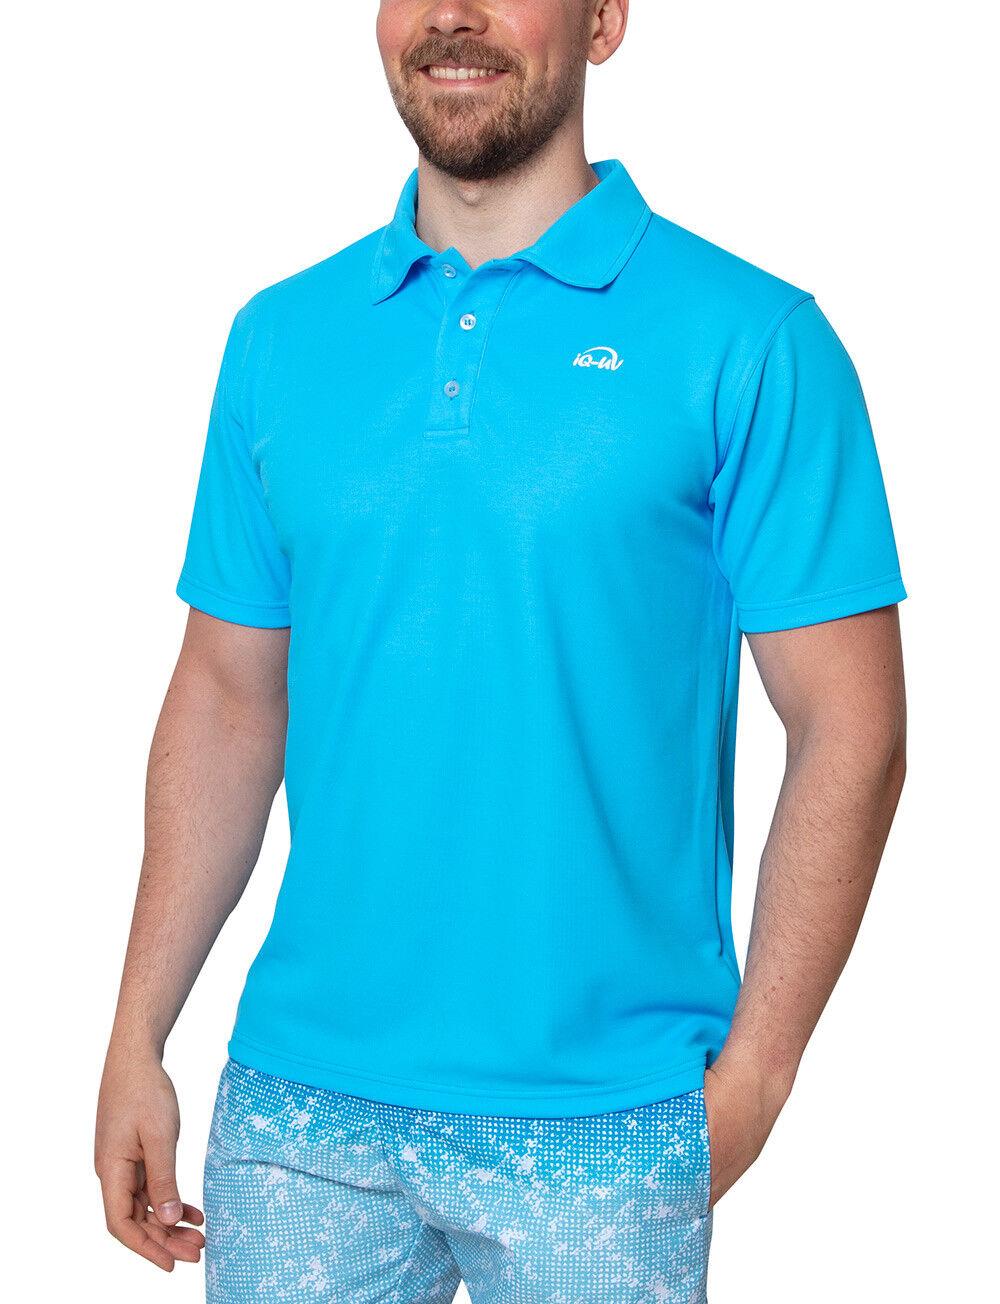 Iq UV 50+ Polo men UV Shirt (Hawaii) 515122 - Nuovo